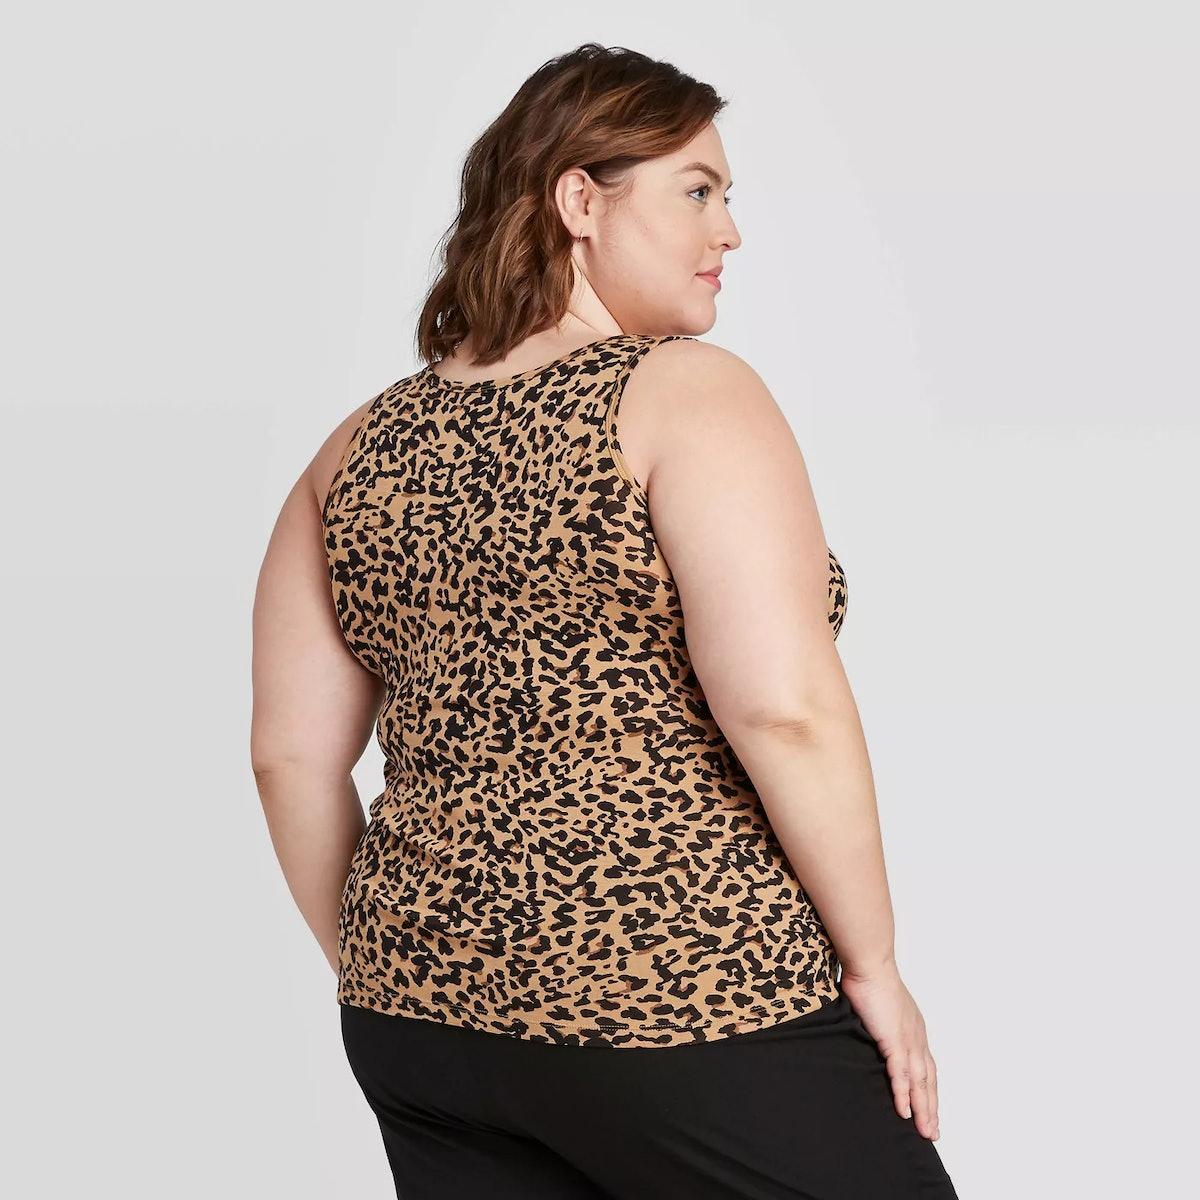 Ava & Viv Women's Plus Size Perfect Tank Top